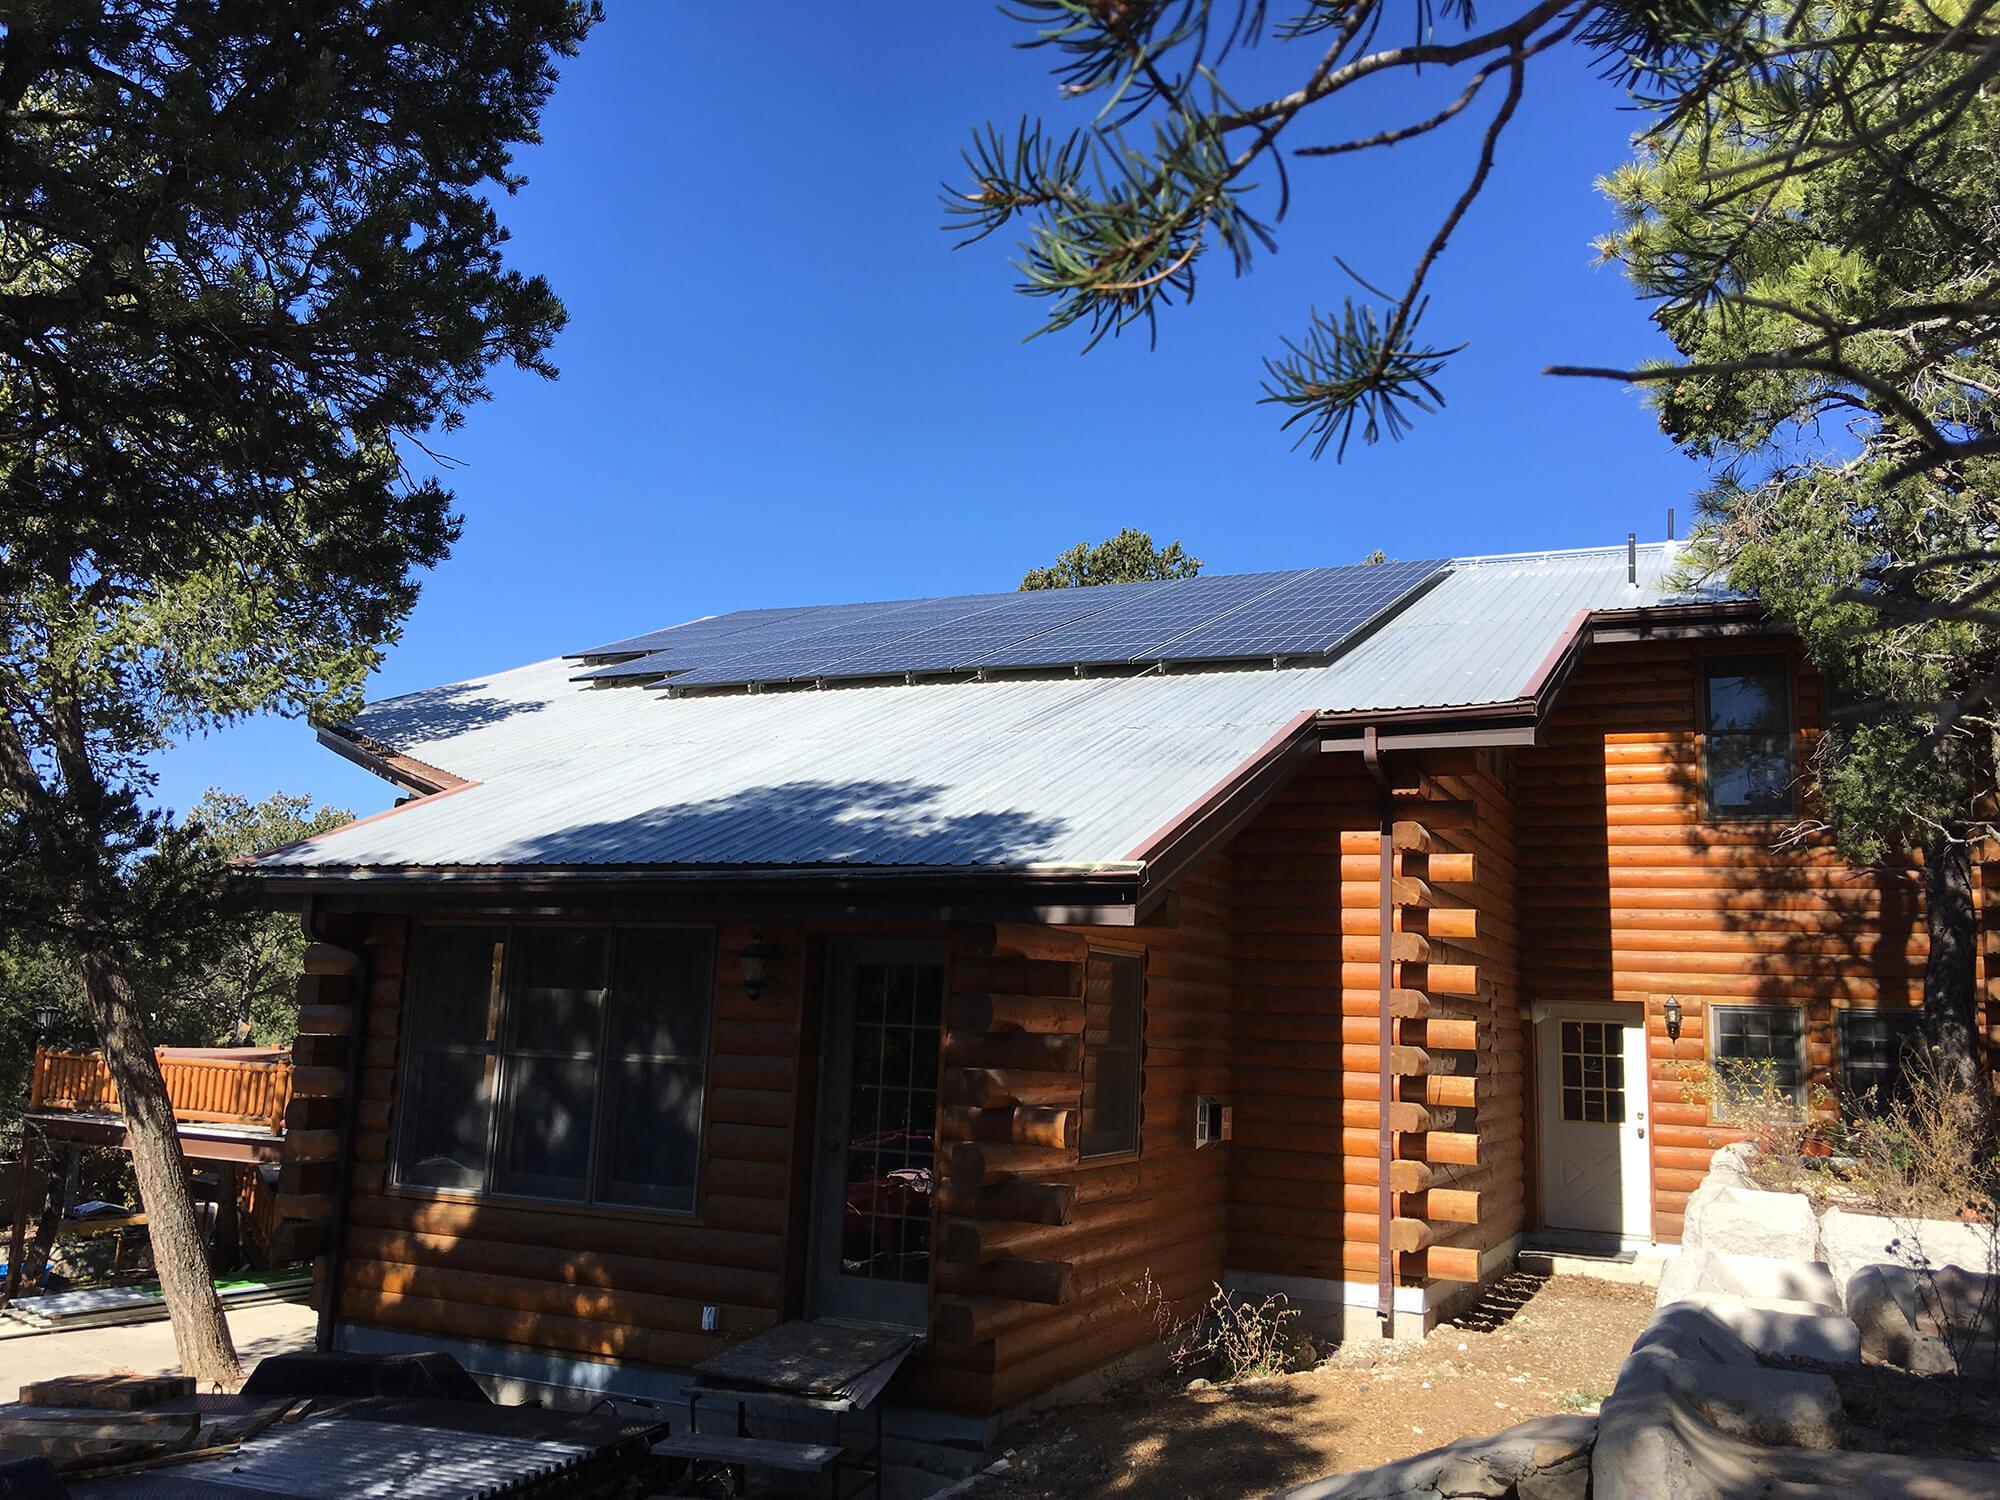 12.6kw solar system installation in Albuquerque